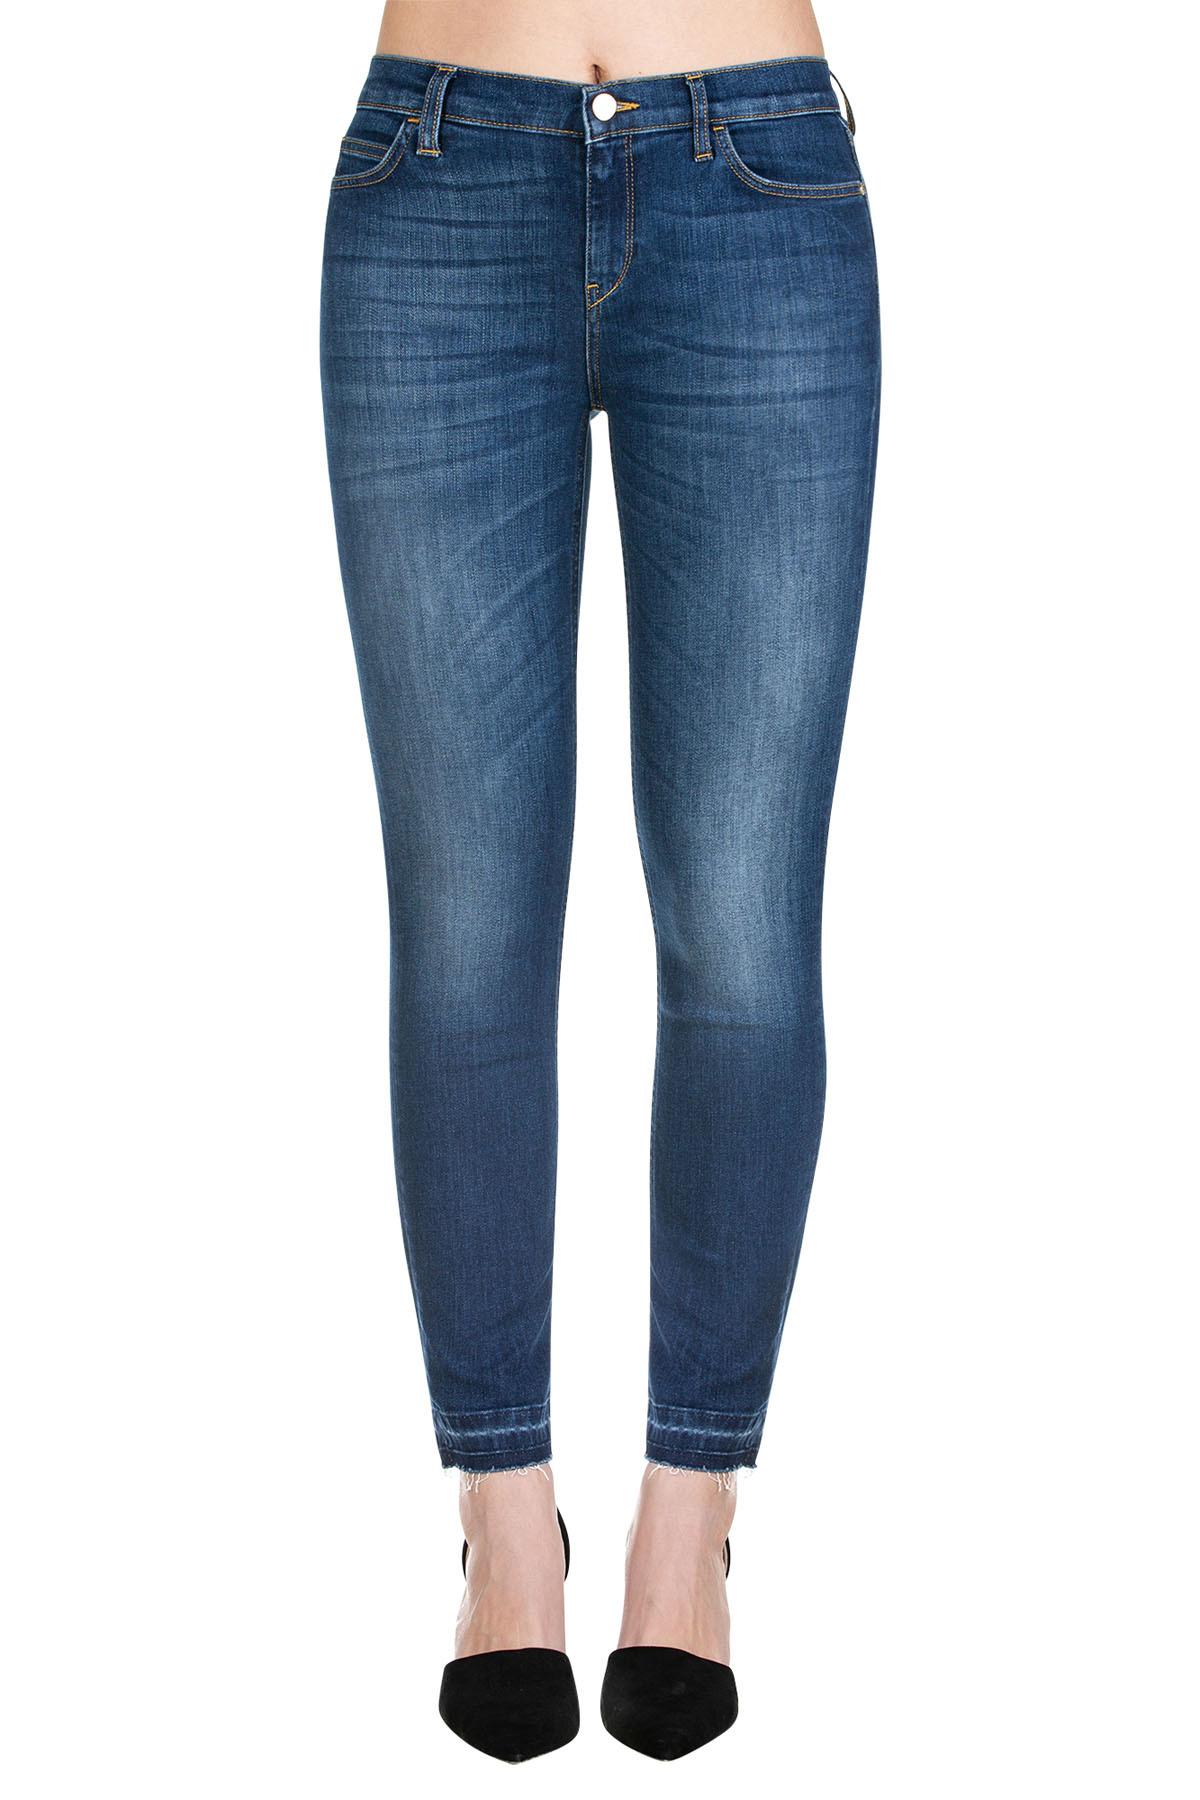 Pantalone Donna Kaos Sara Skinny Basic Crop